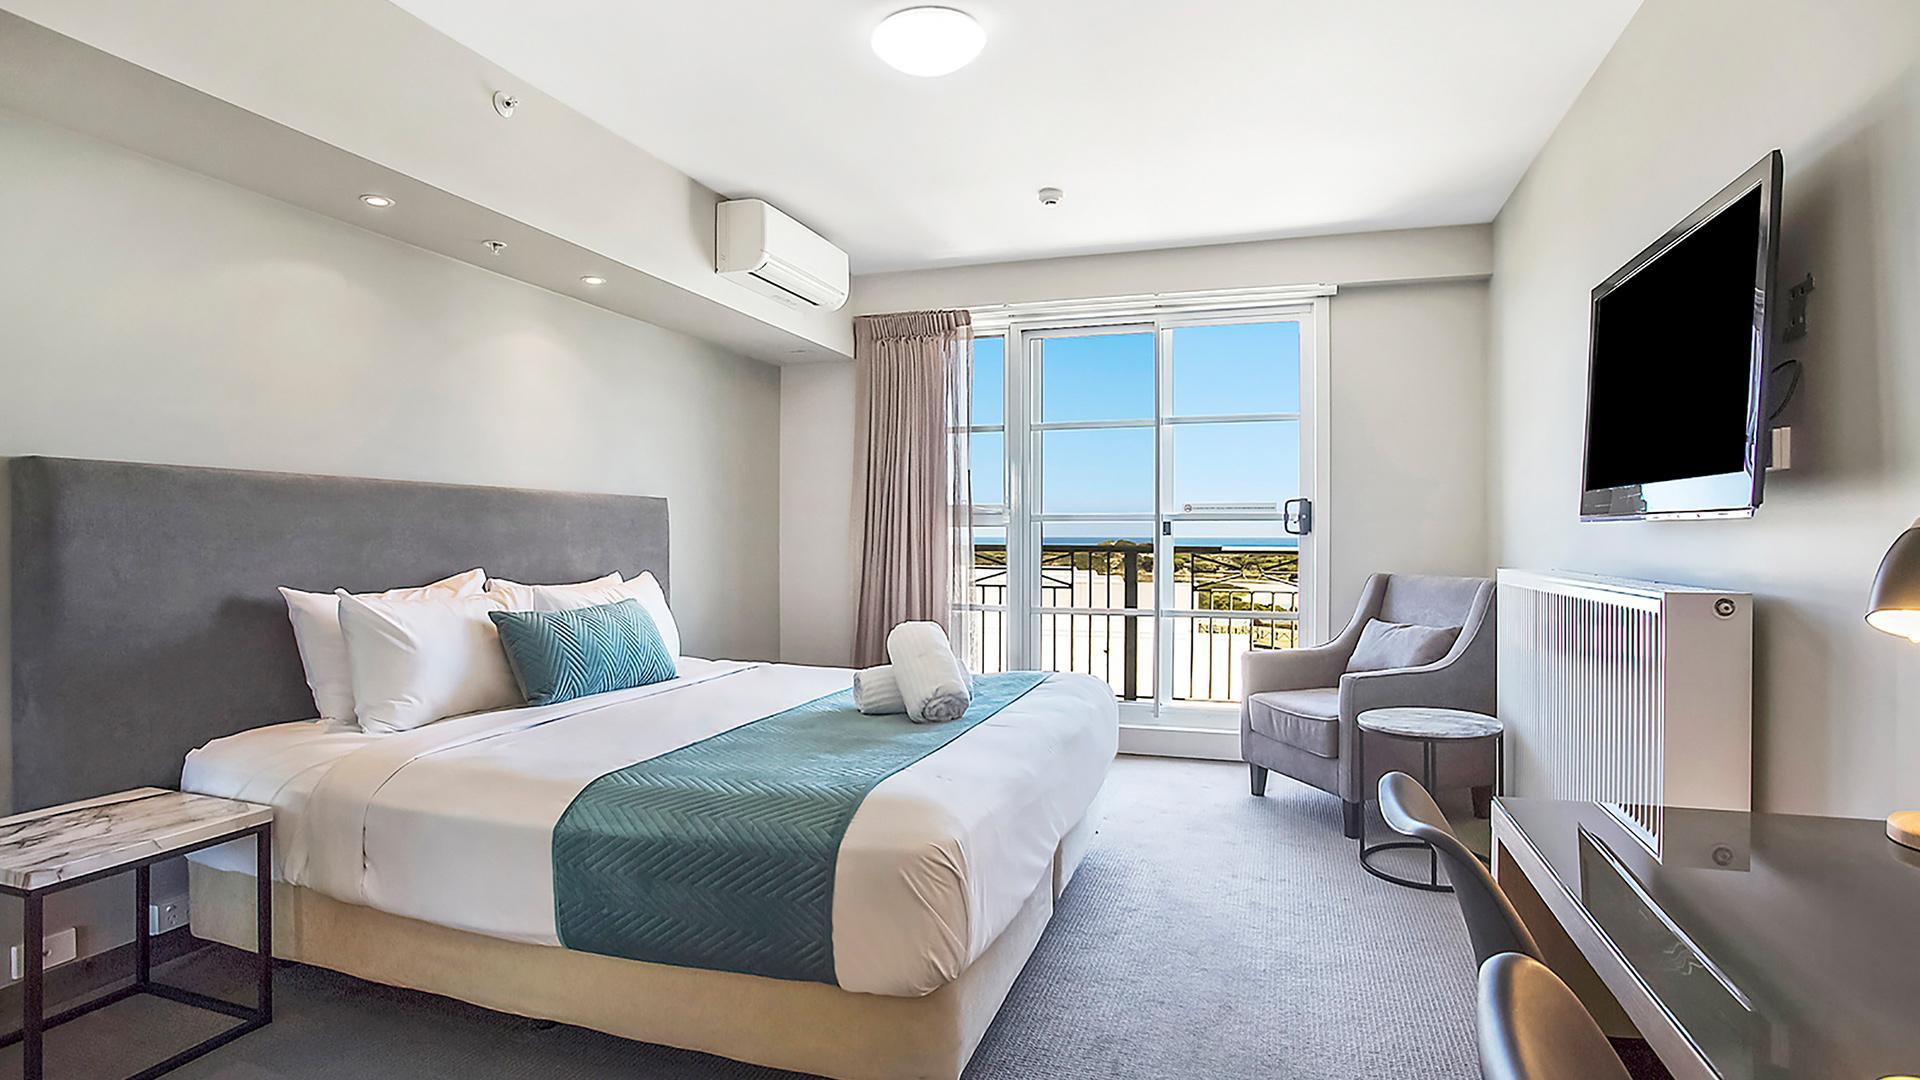 Ocean-View Studio Queen image 1 at Deep Blue Hotel & Hot Springs by Warrnambool City, Victoria, Australia